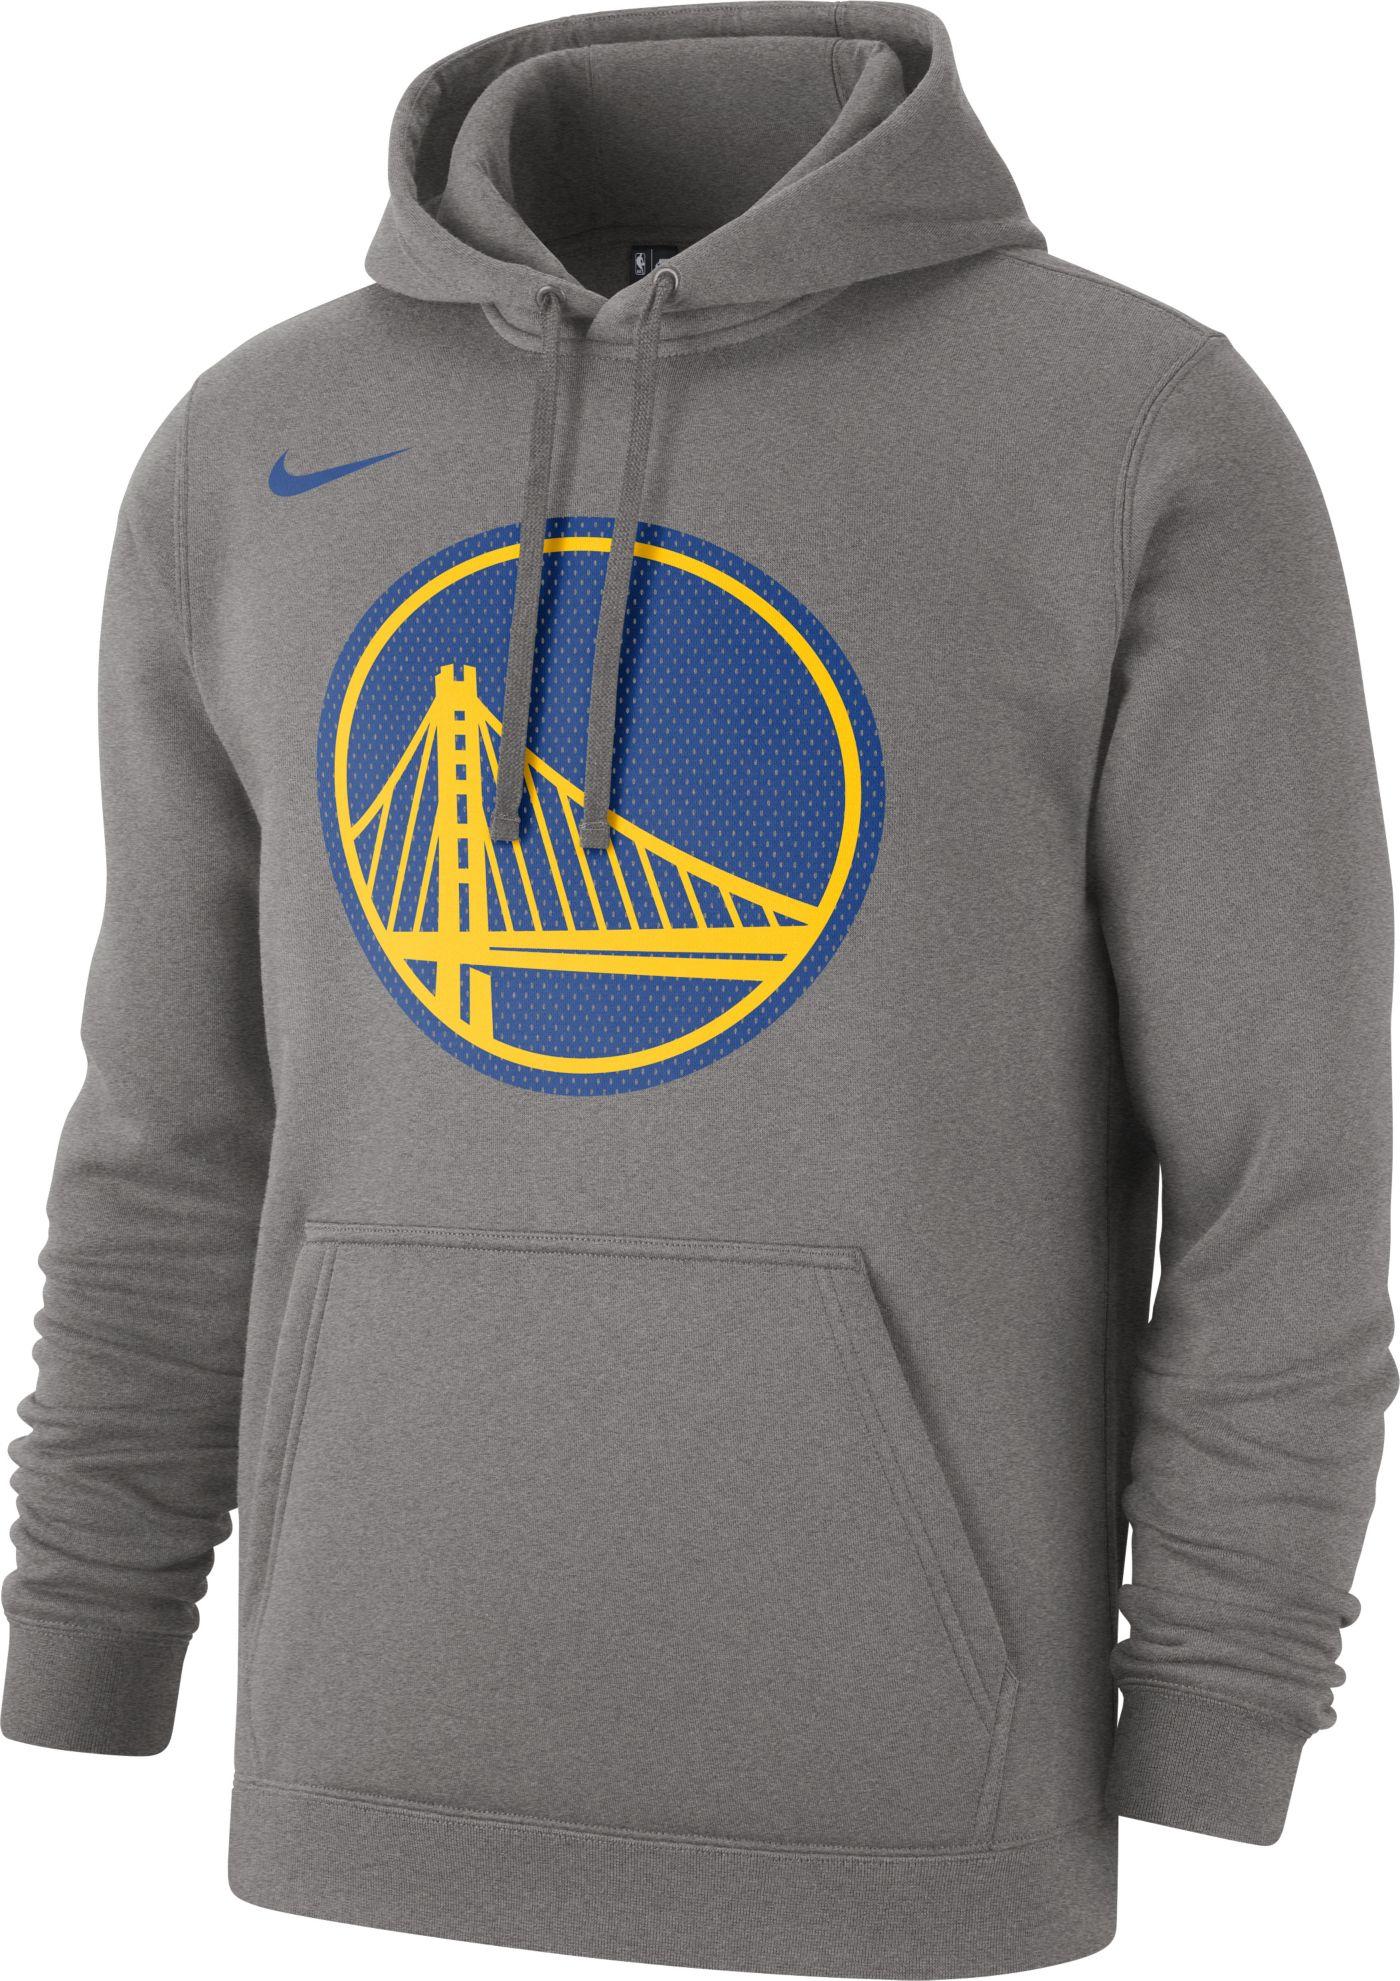 Nike Men's Golden State Warriors Pullover Hoodie